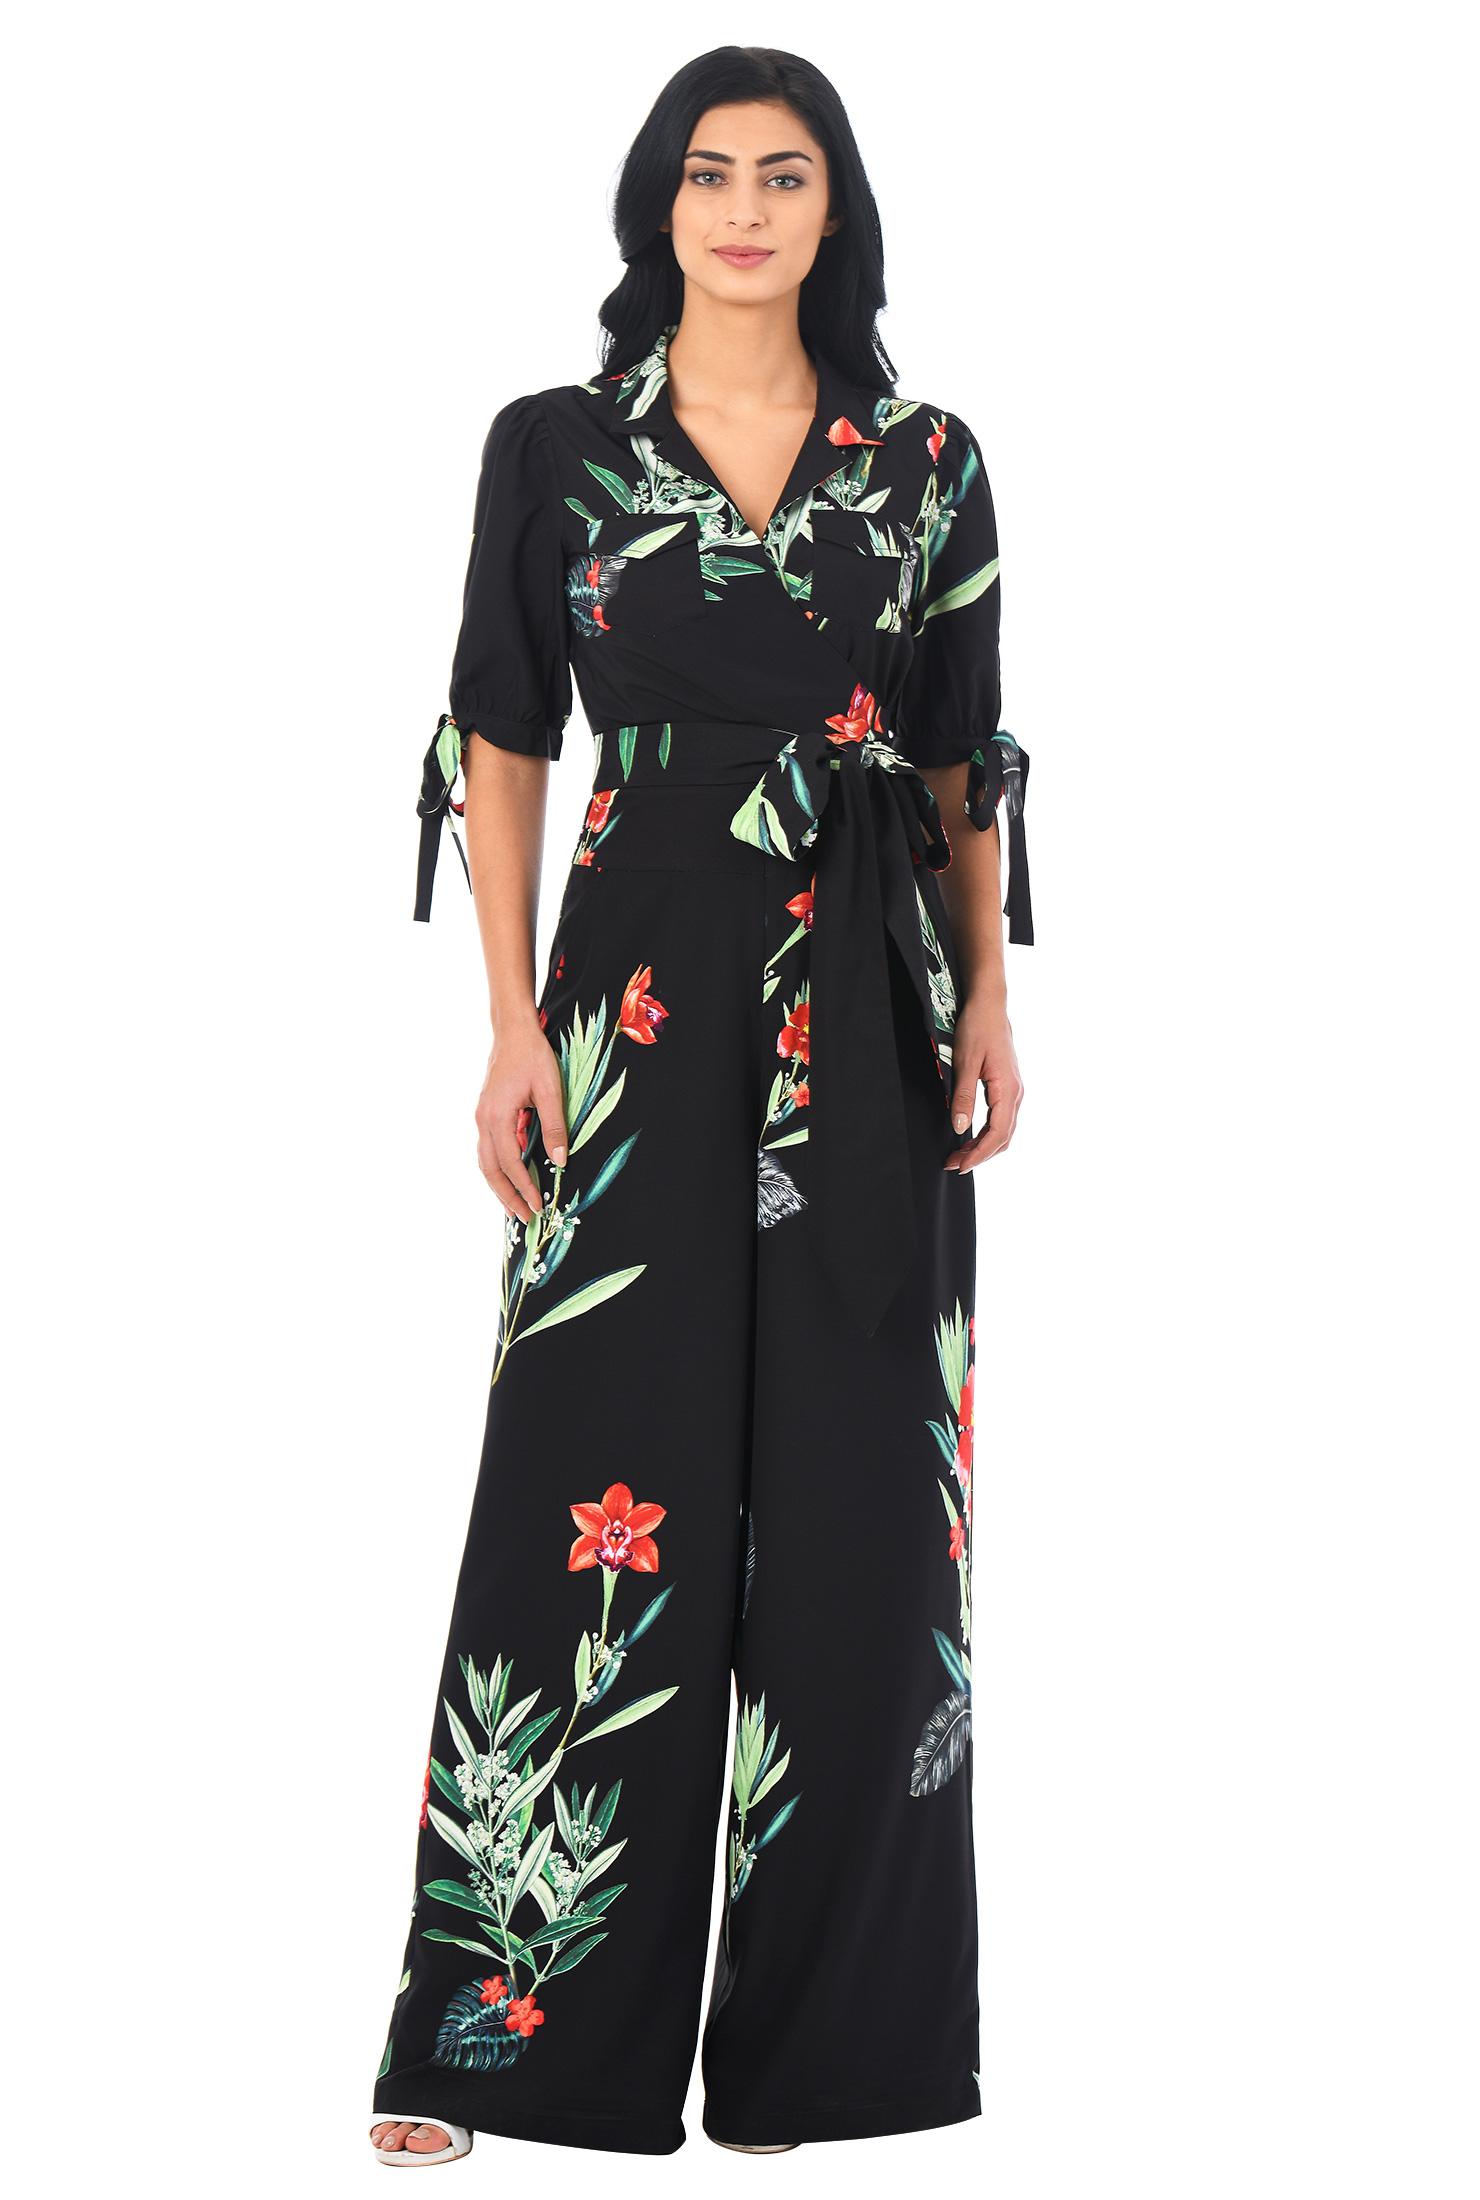 692c82232b89 Women s Fashion Clothing 0-36W and Custom